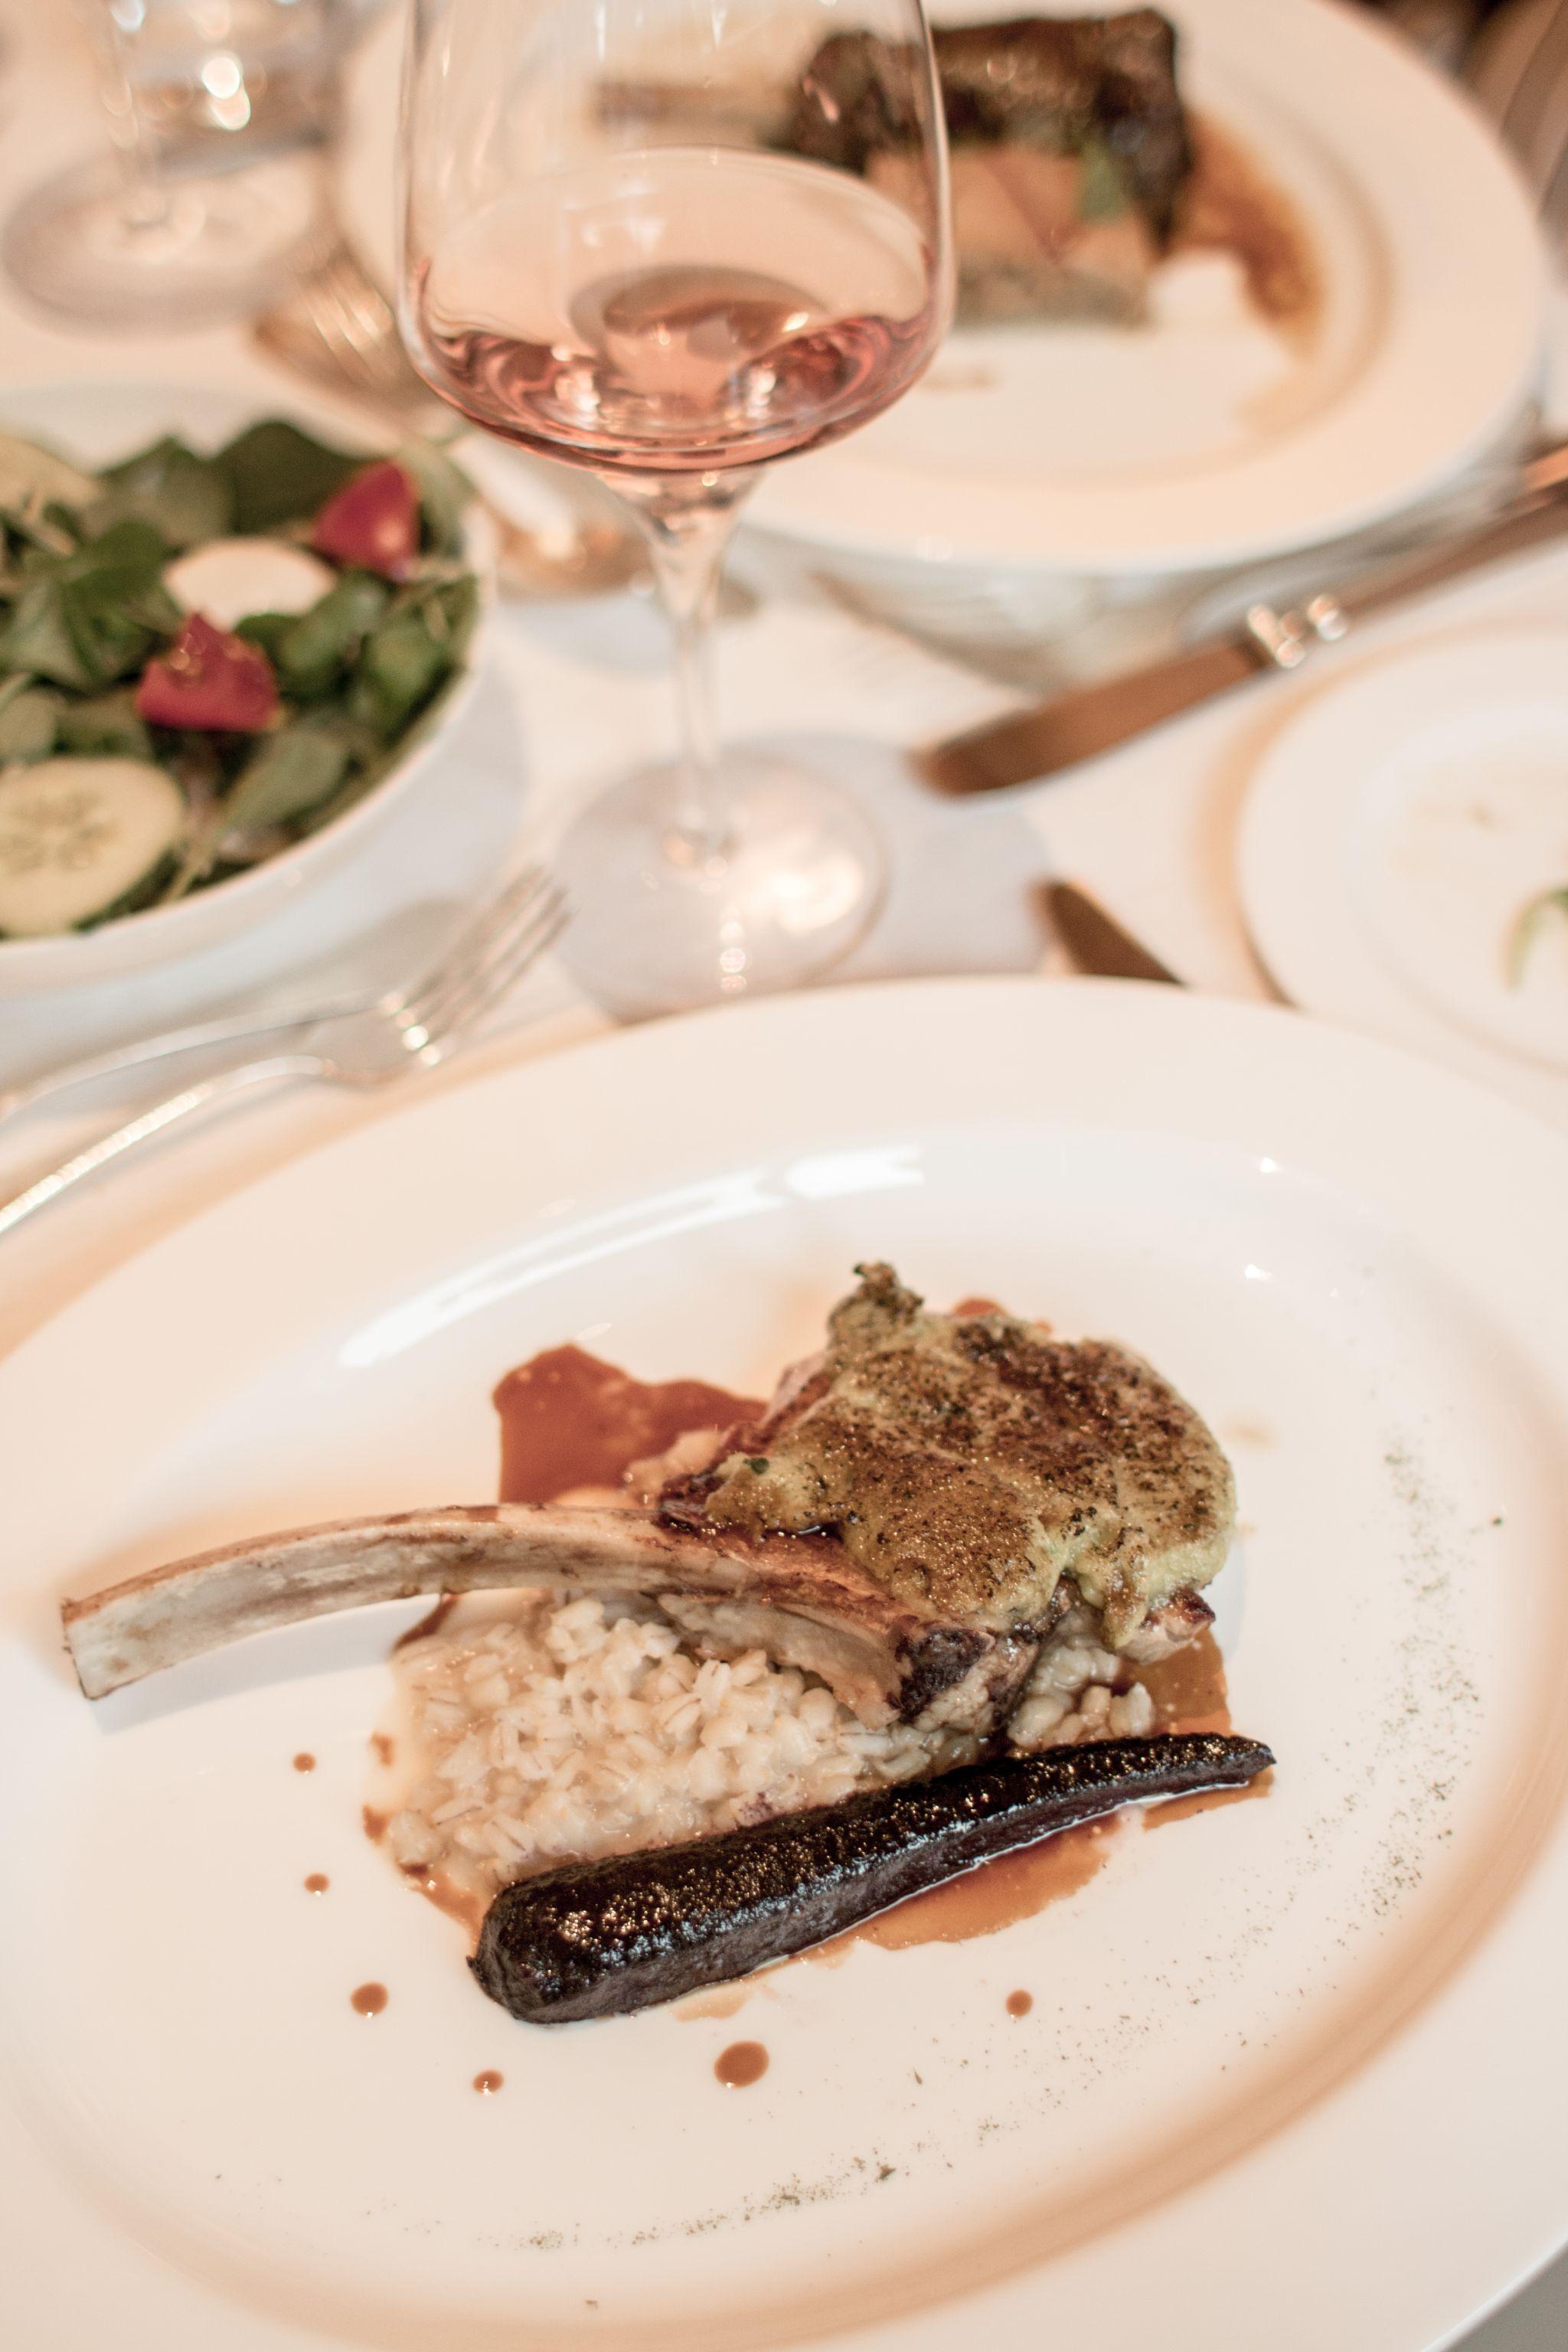 Adler Dolomites Hotel Ortisei Italy Hotel Hospitality Brand Photography Evening Meal Italian Food